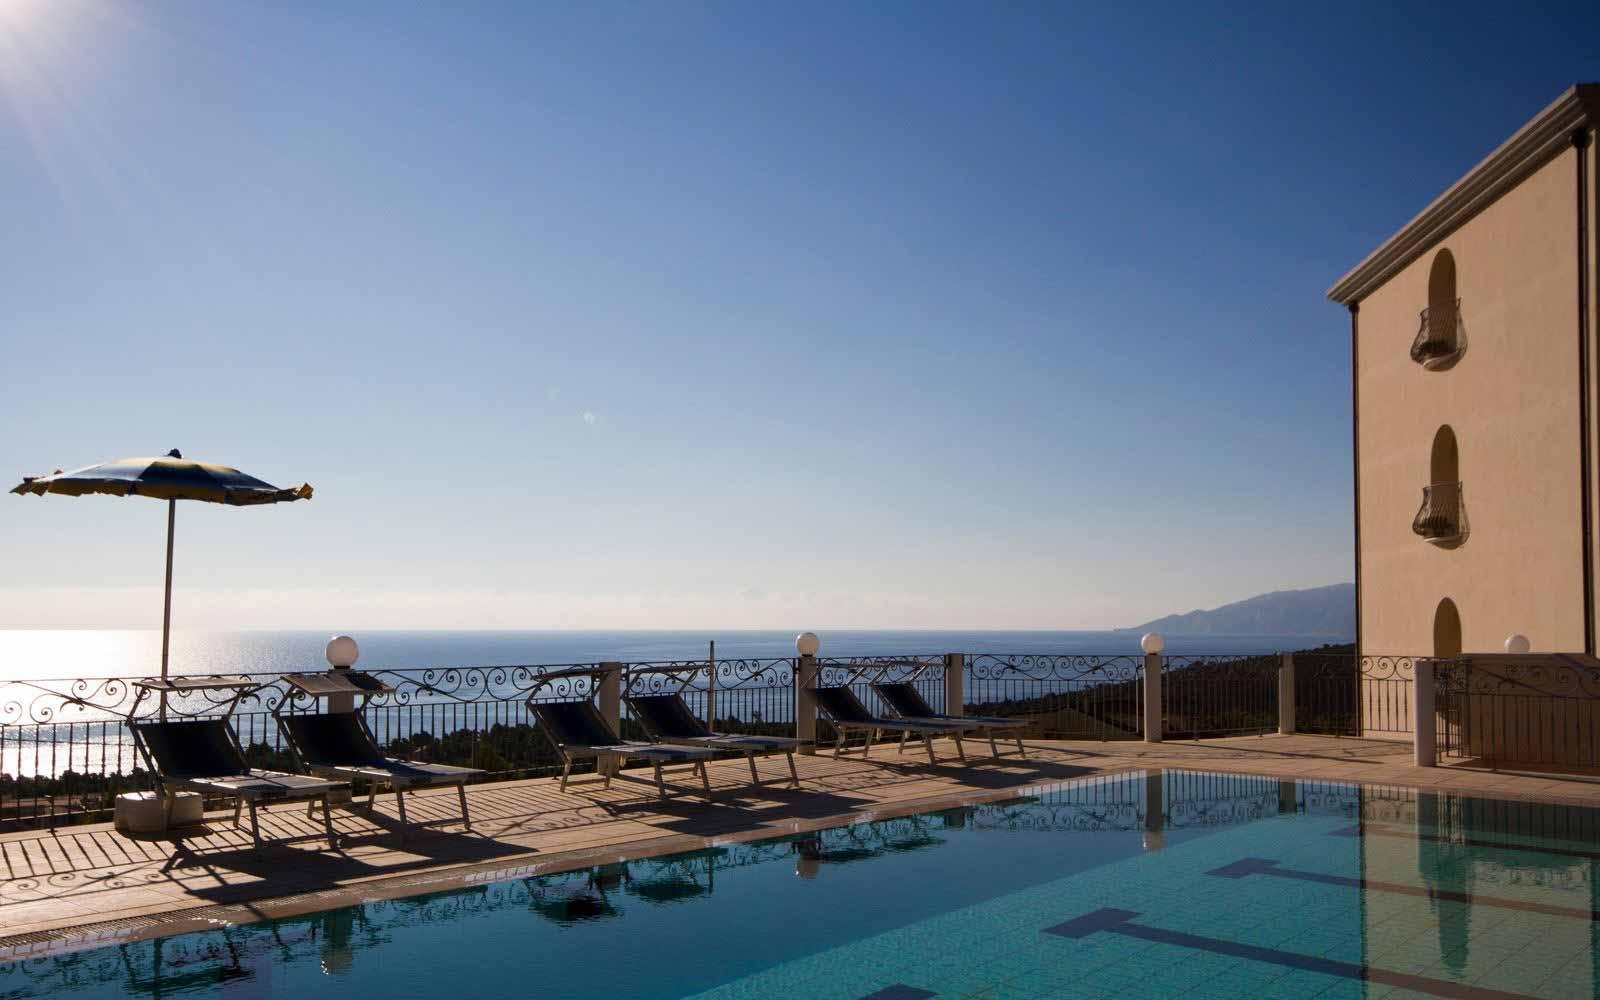 Panoramic view from Hotel Brancamaria